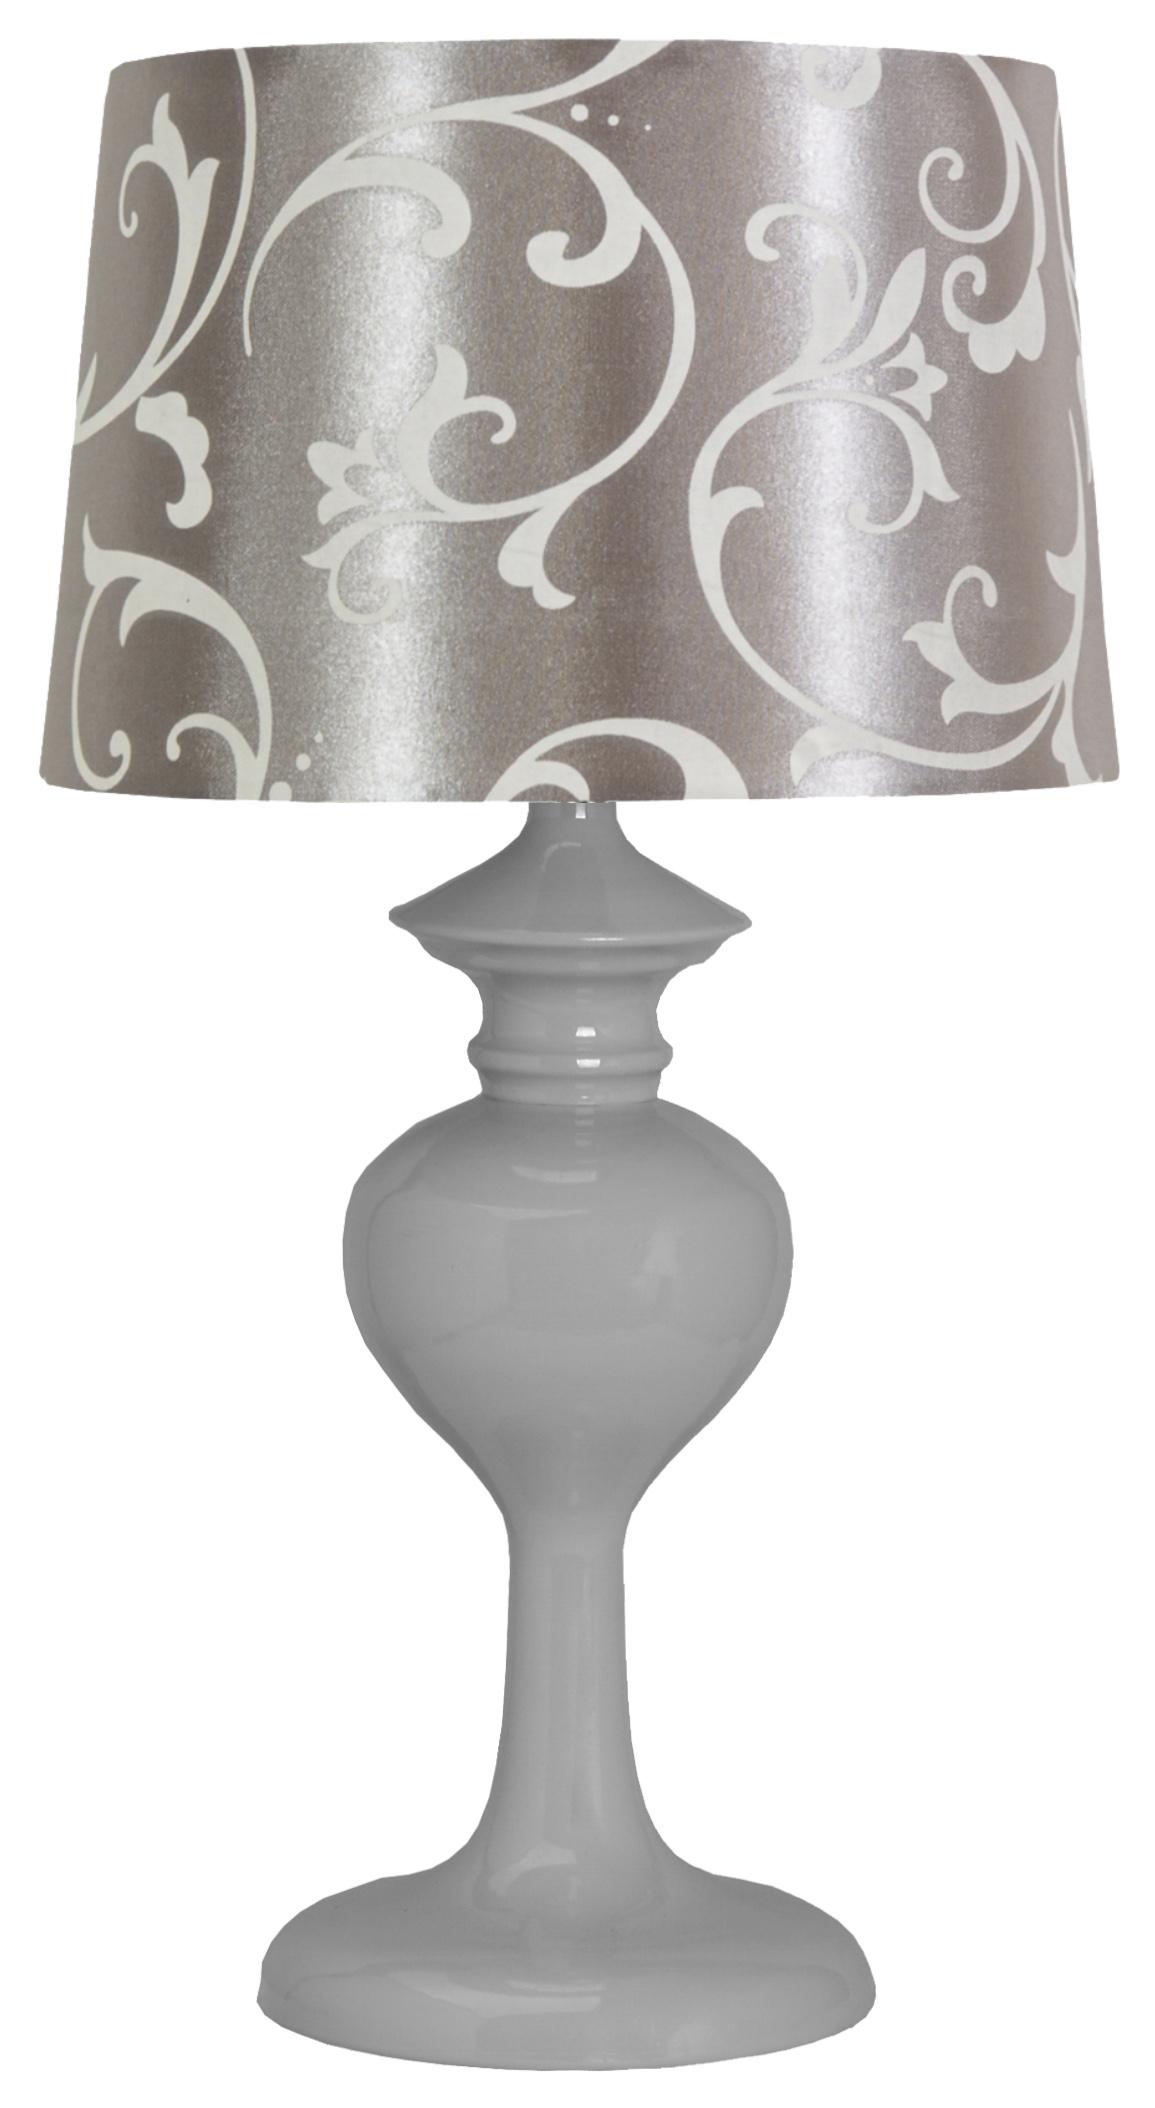 BERKANE LAMPA 1X40W E14 SZARY/SZARY - 41-64424